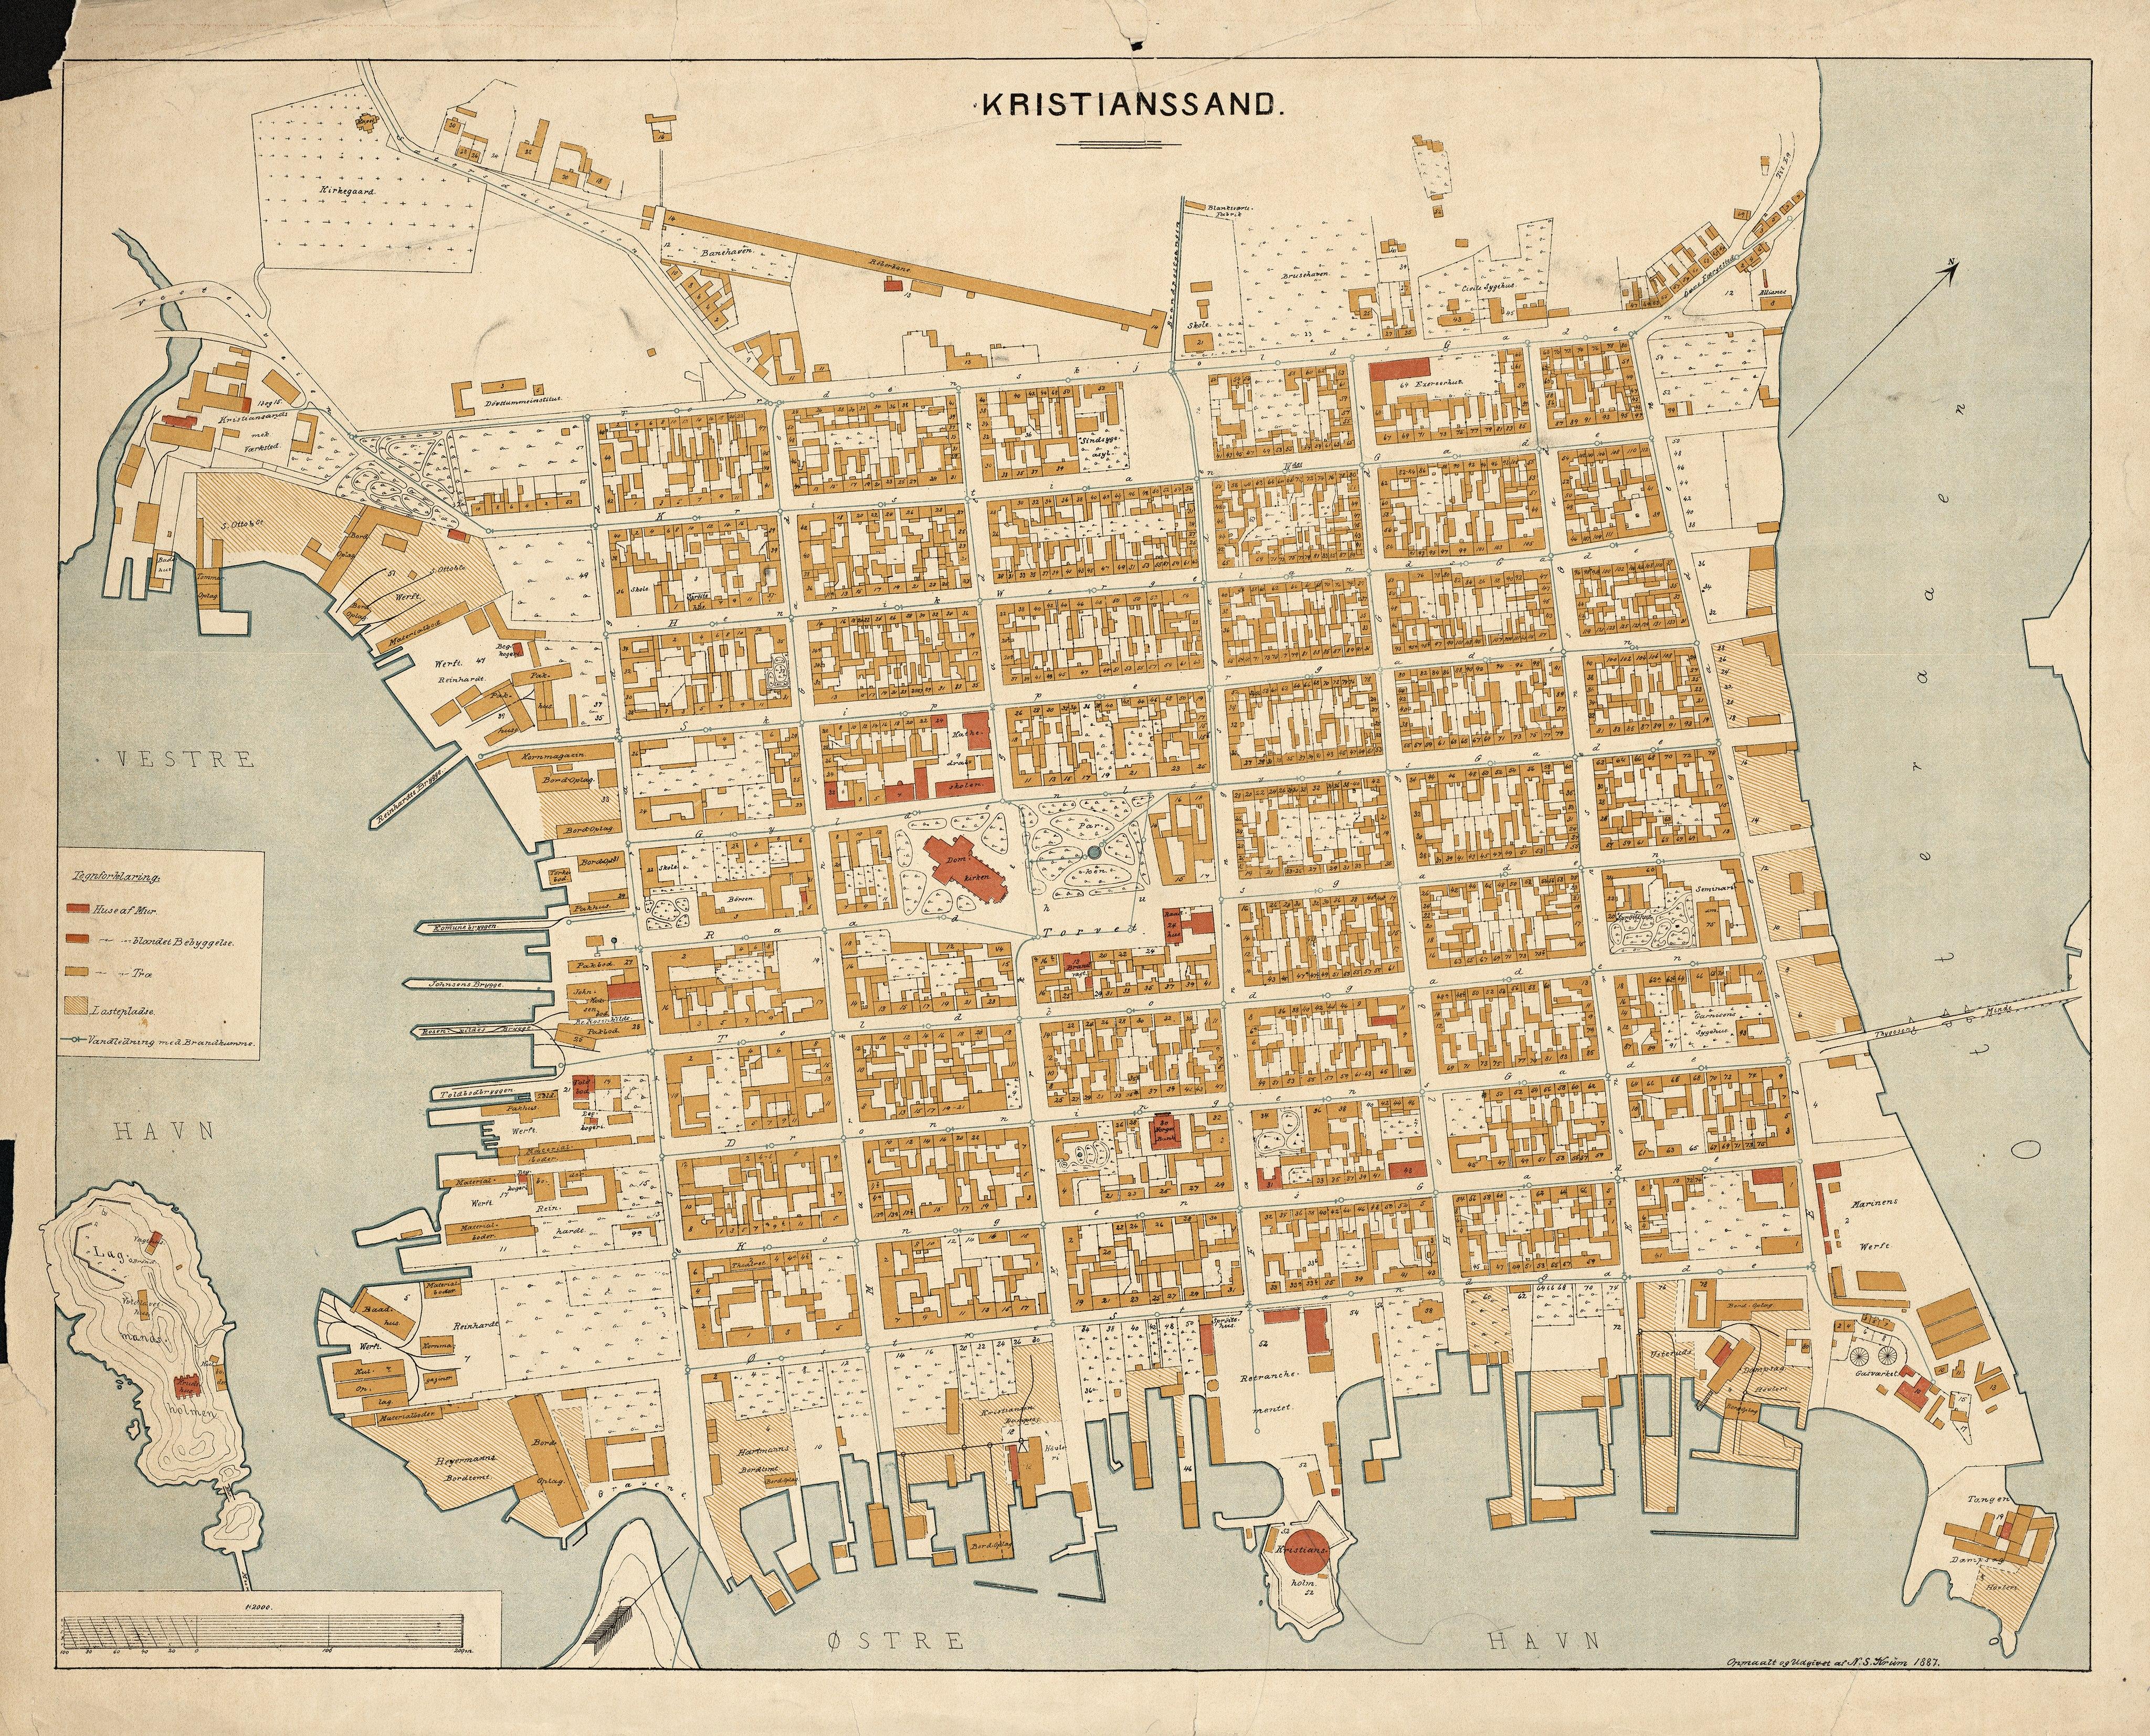 Kristiansand 1887